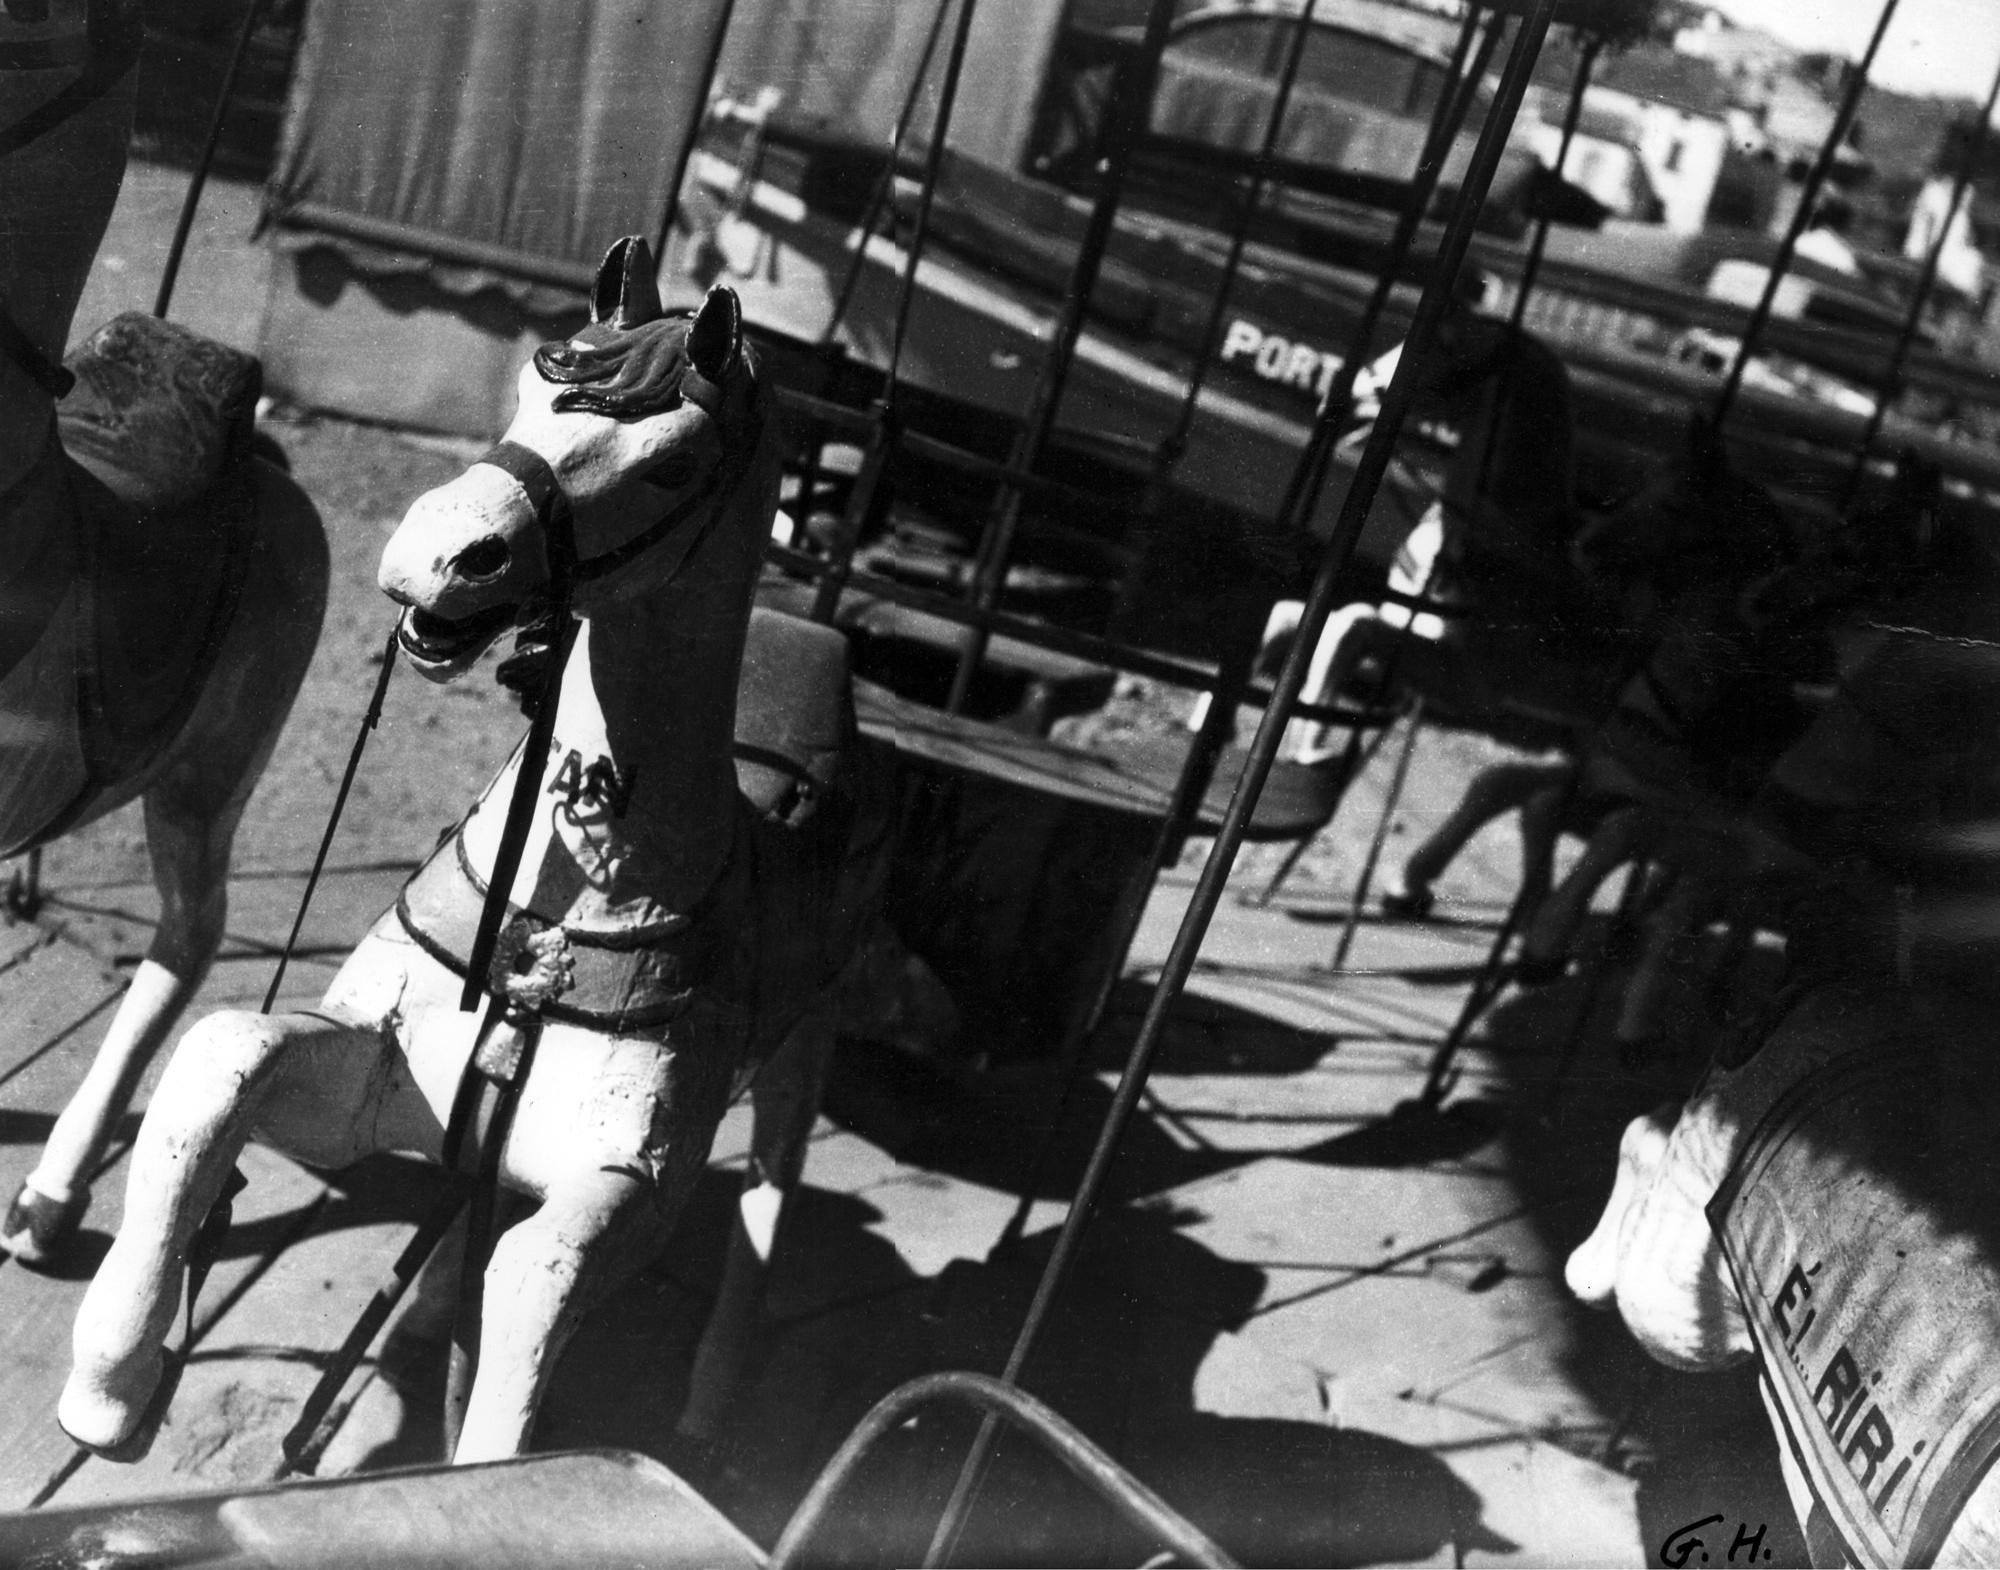 Carrousel, 1928